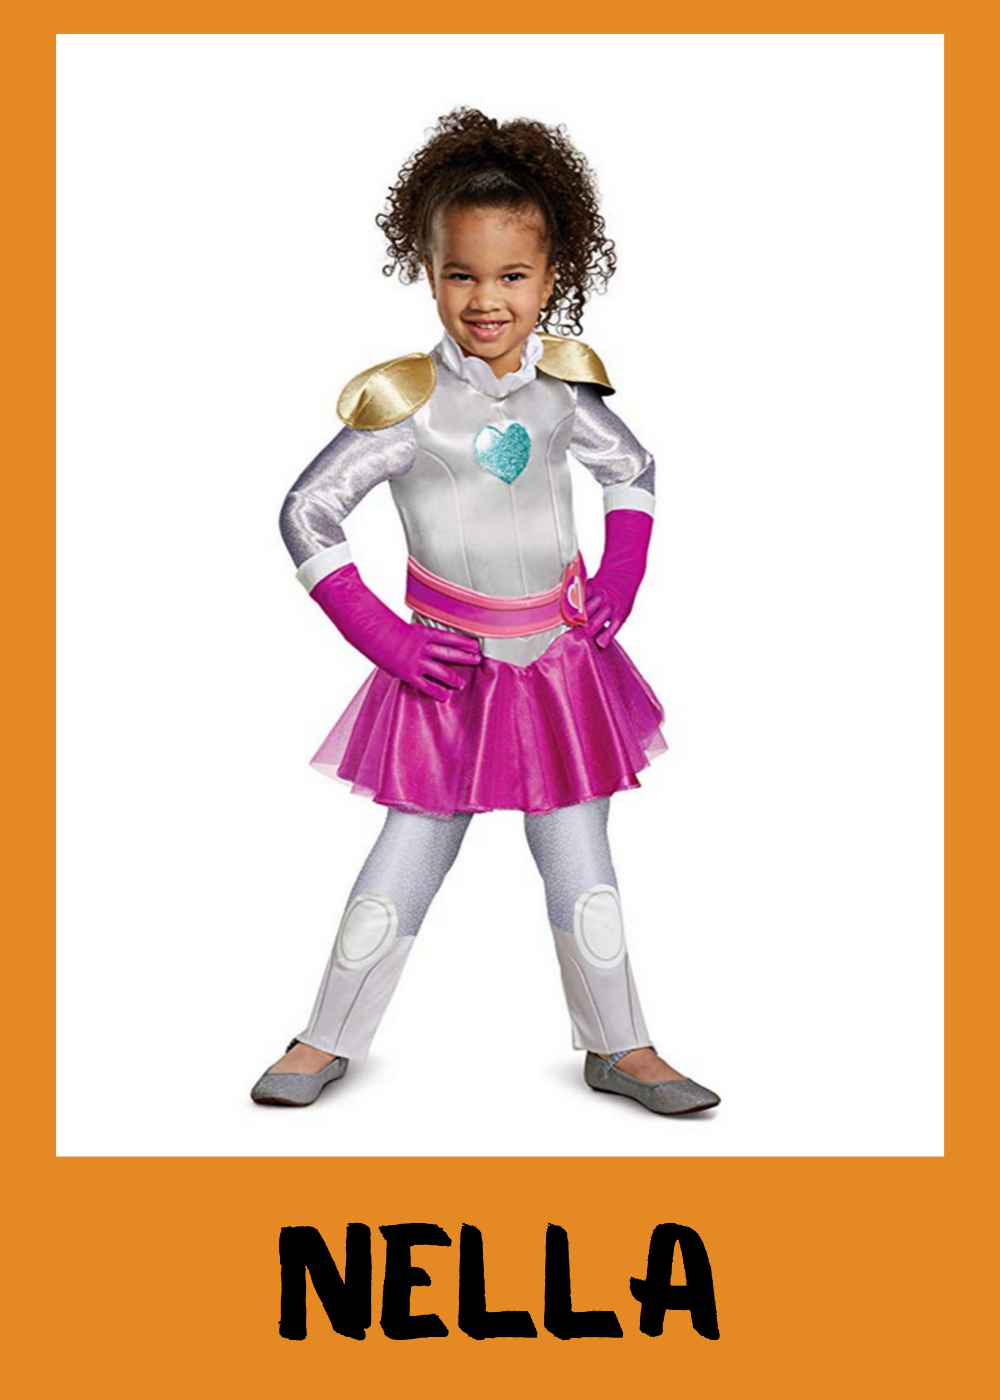 Nella the Princess Knight   for $12 plus shipping.